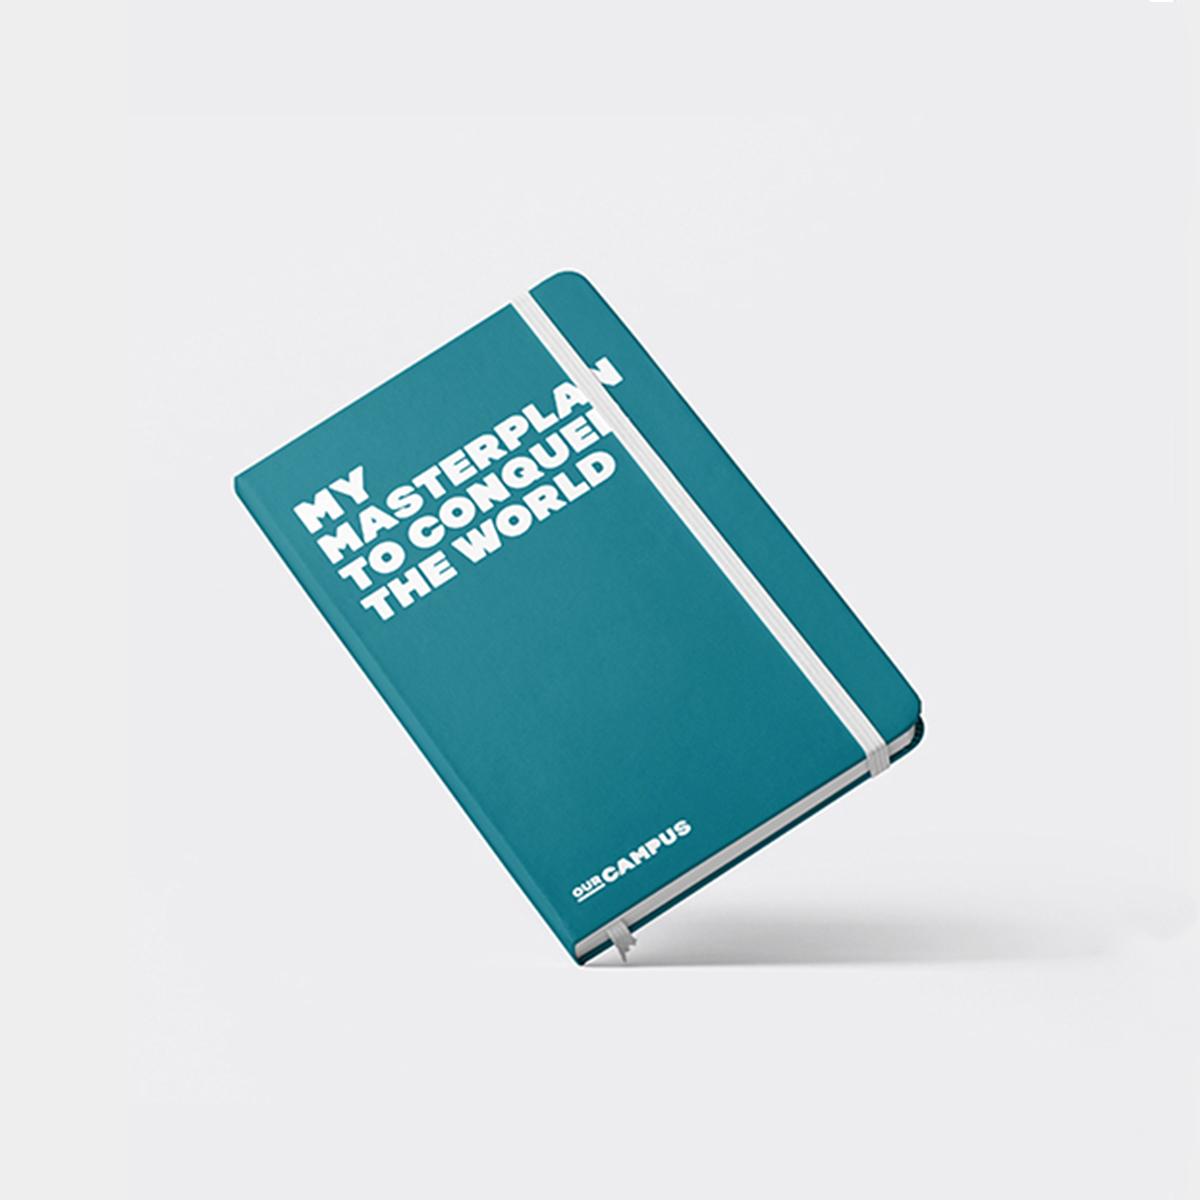 SPX Agency Work: OurCampus Merchandising, book